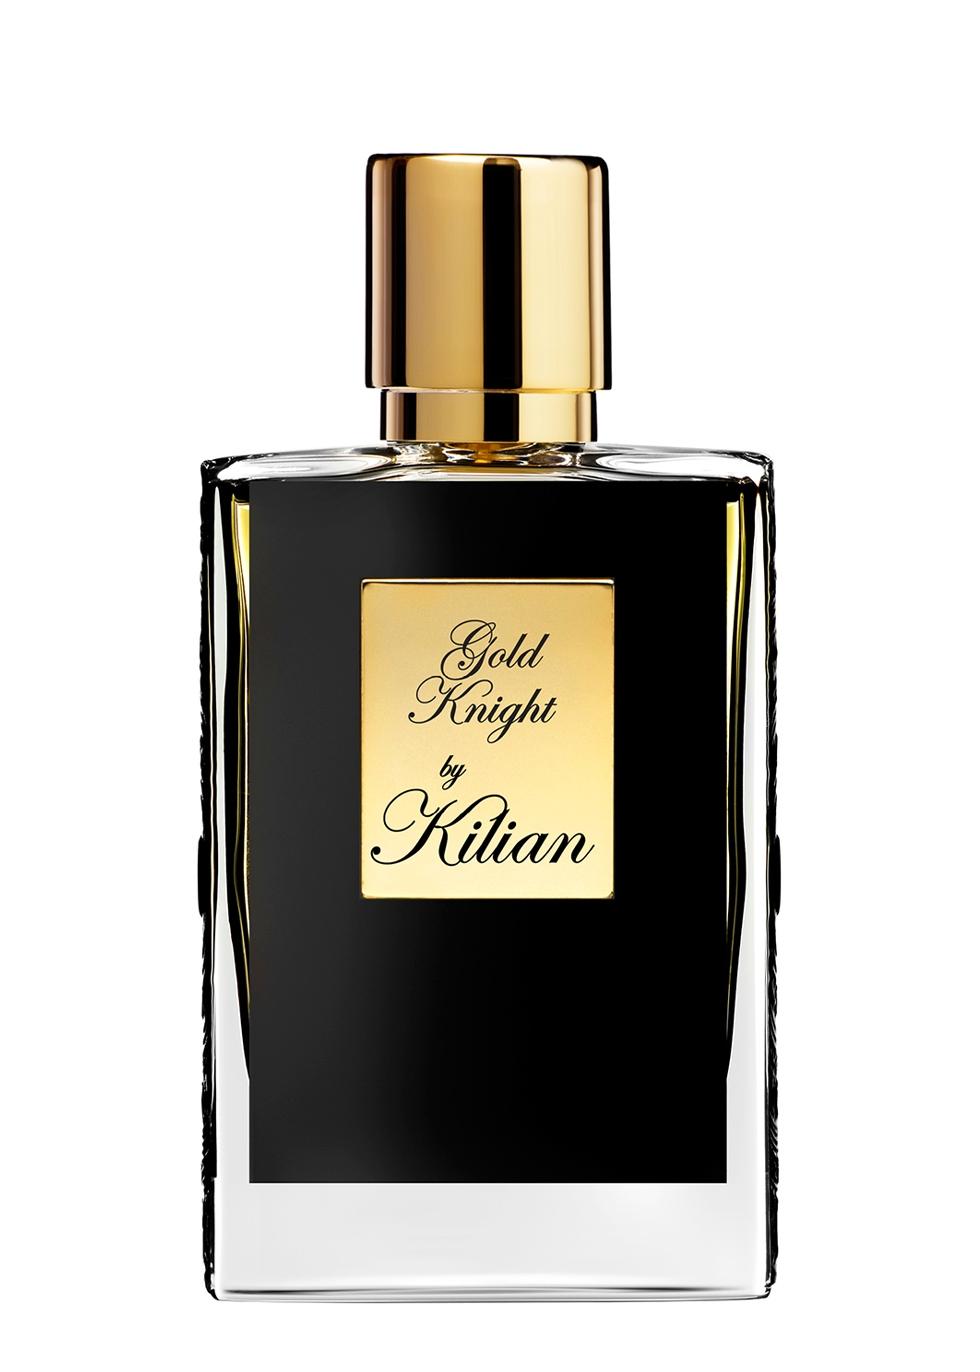 KILIAN Gold Knight eau de parfum 50ml